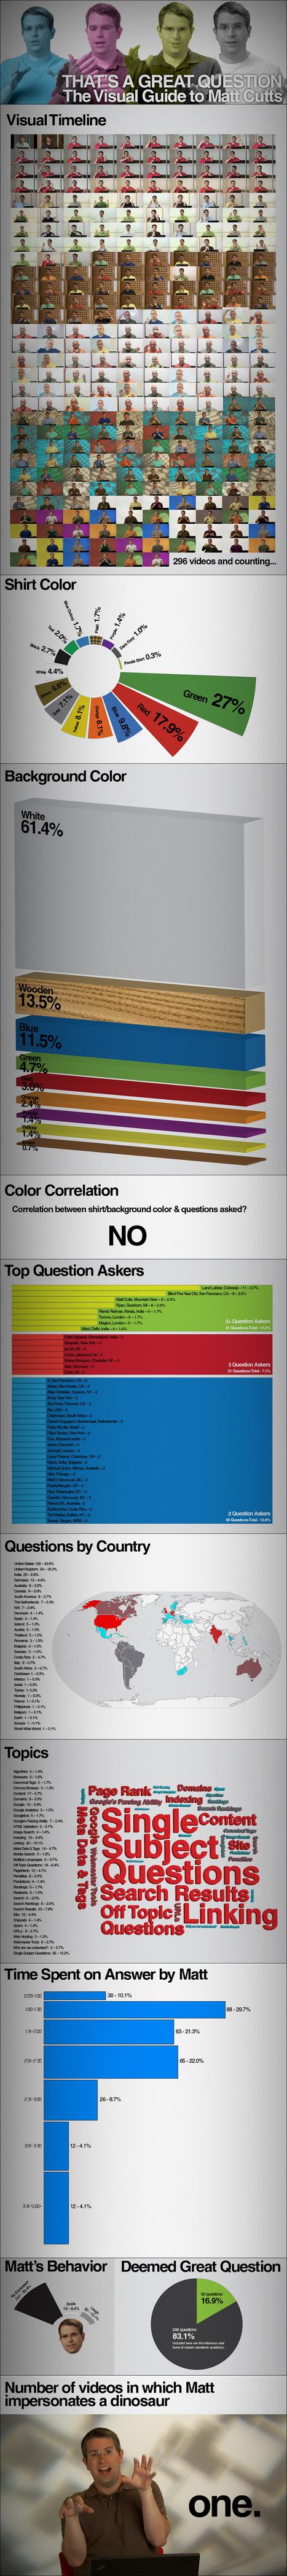 Matt Cutts Infographic | Online Marketing Resources | Scoop.it